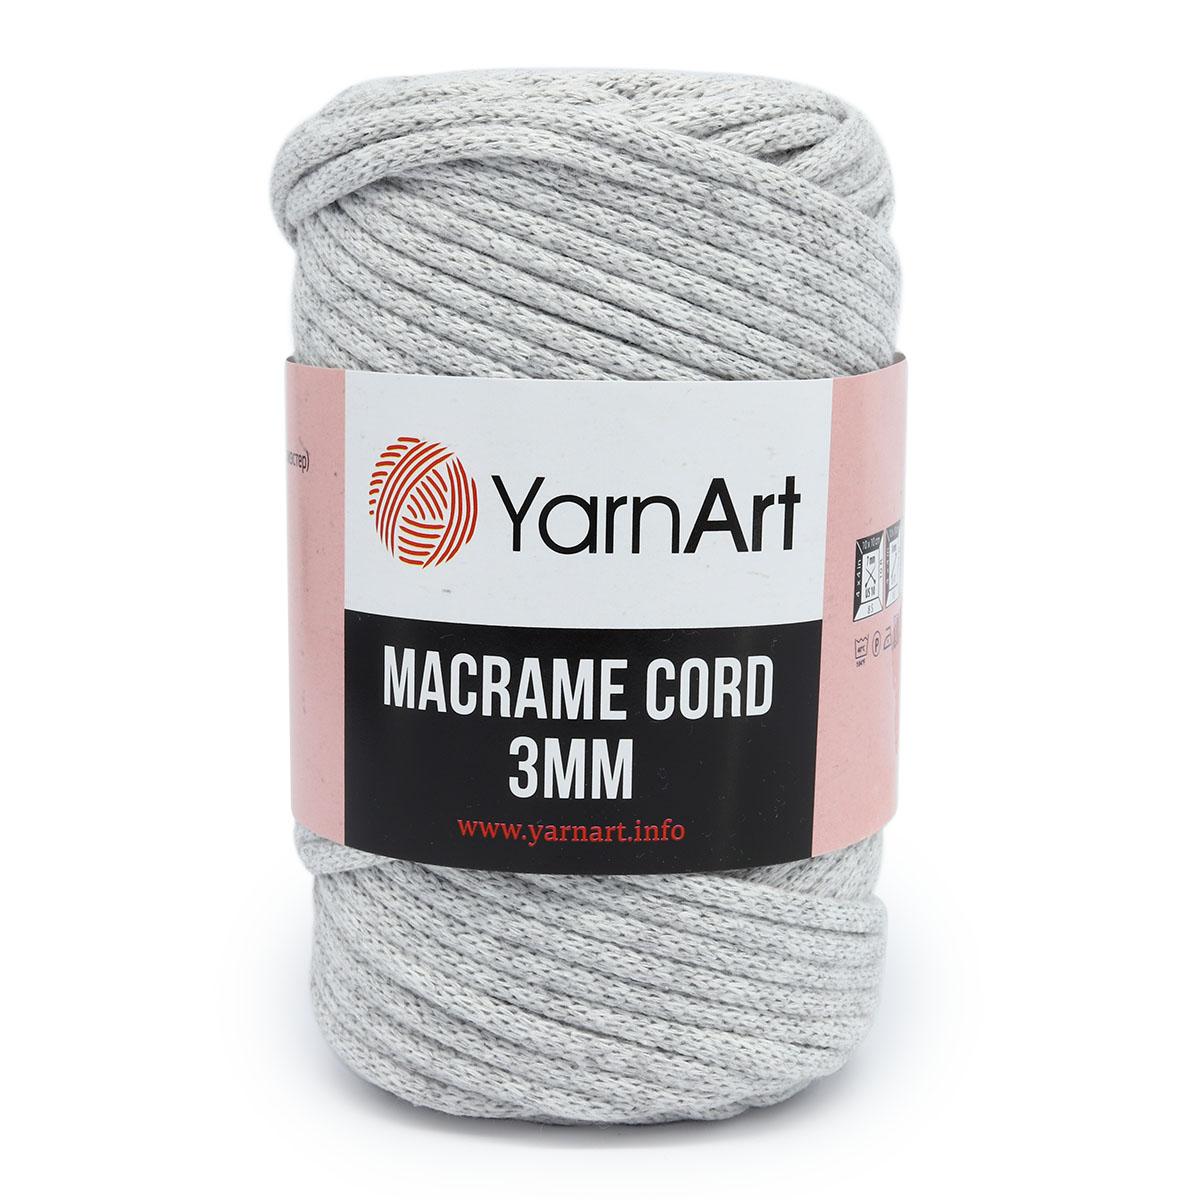 Пряжа YarnArt 'Macrame Cord 3мм' 250гр 85м (60% хлопок, 40% вискоза и полиэстер)